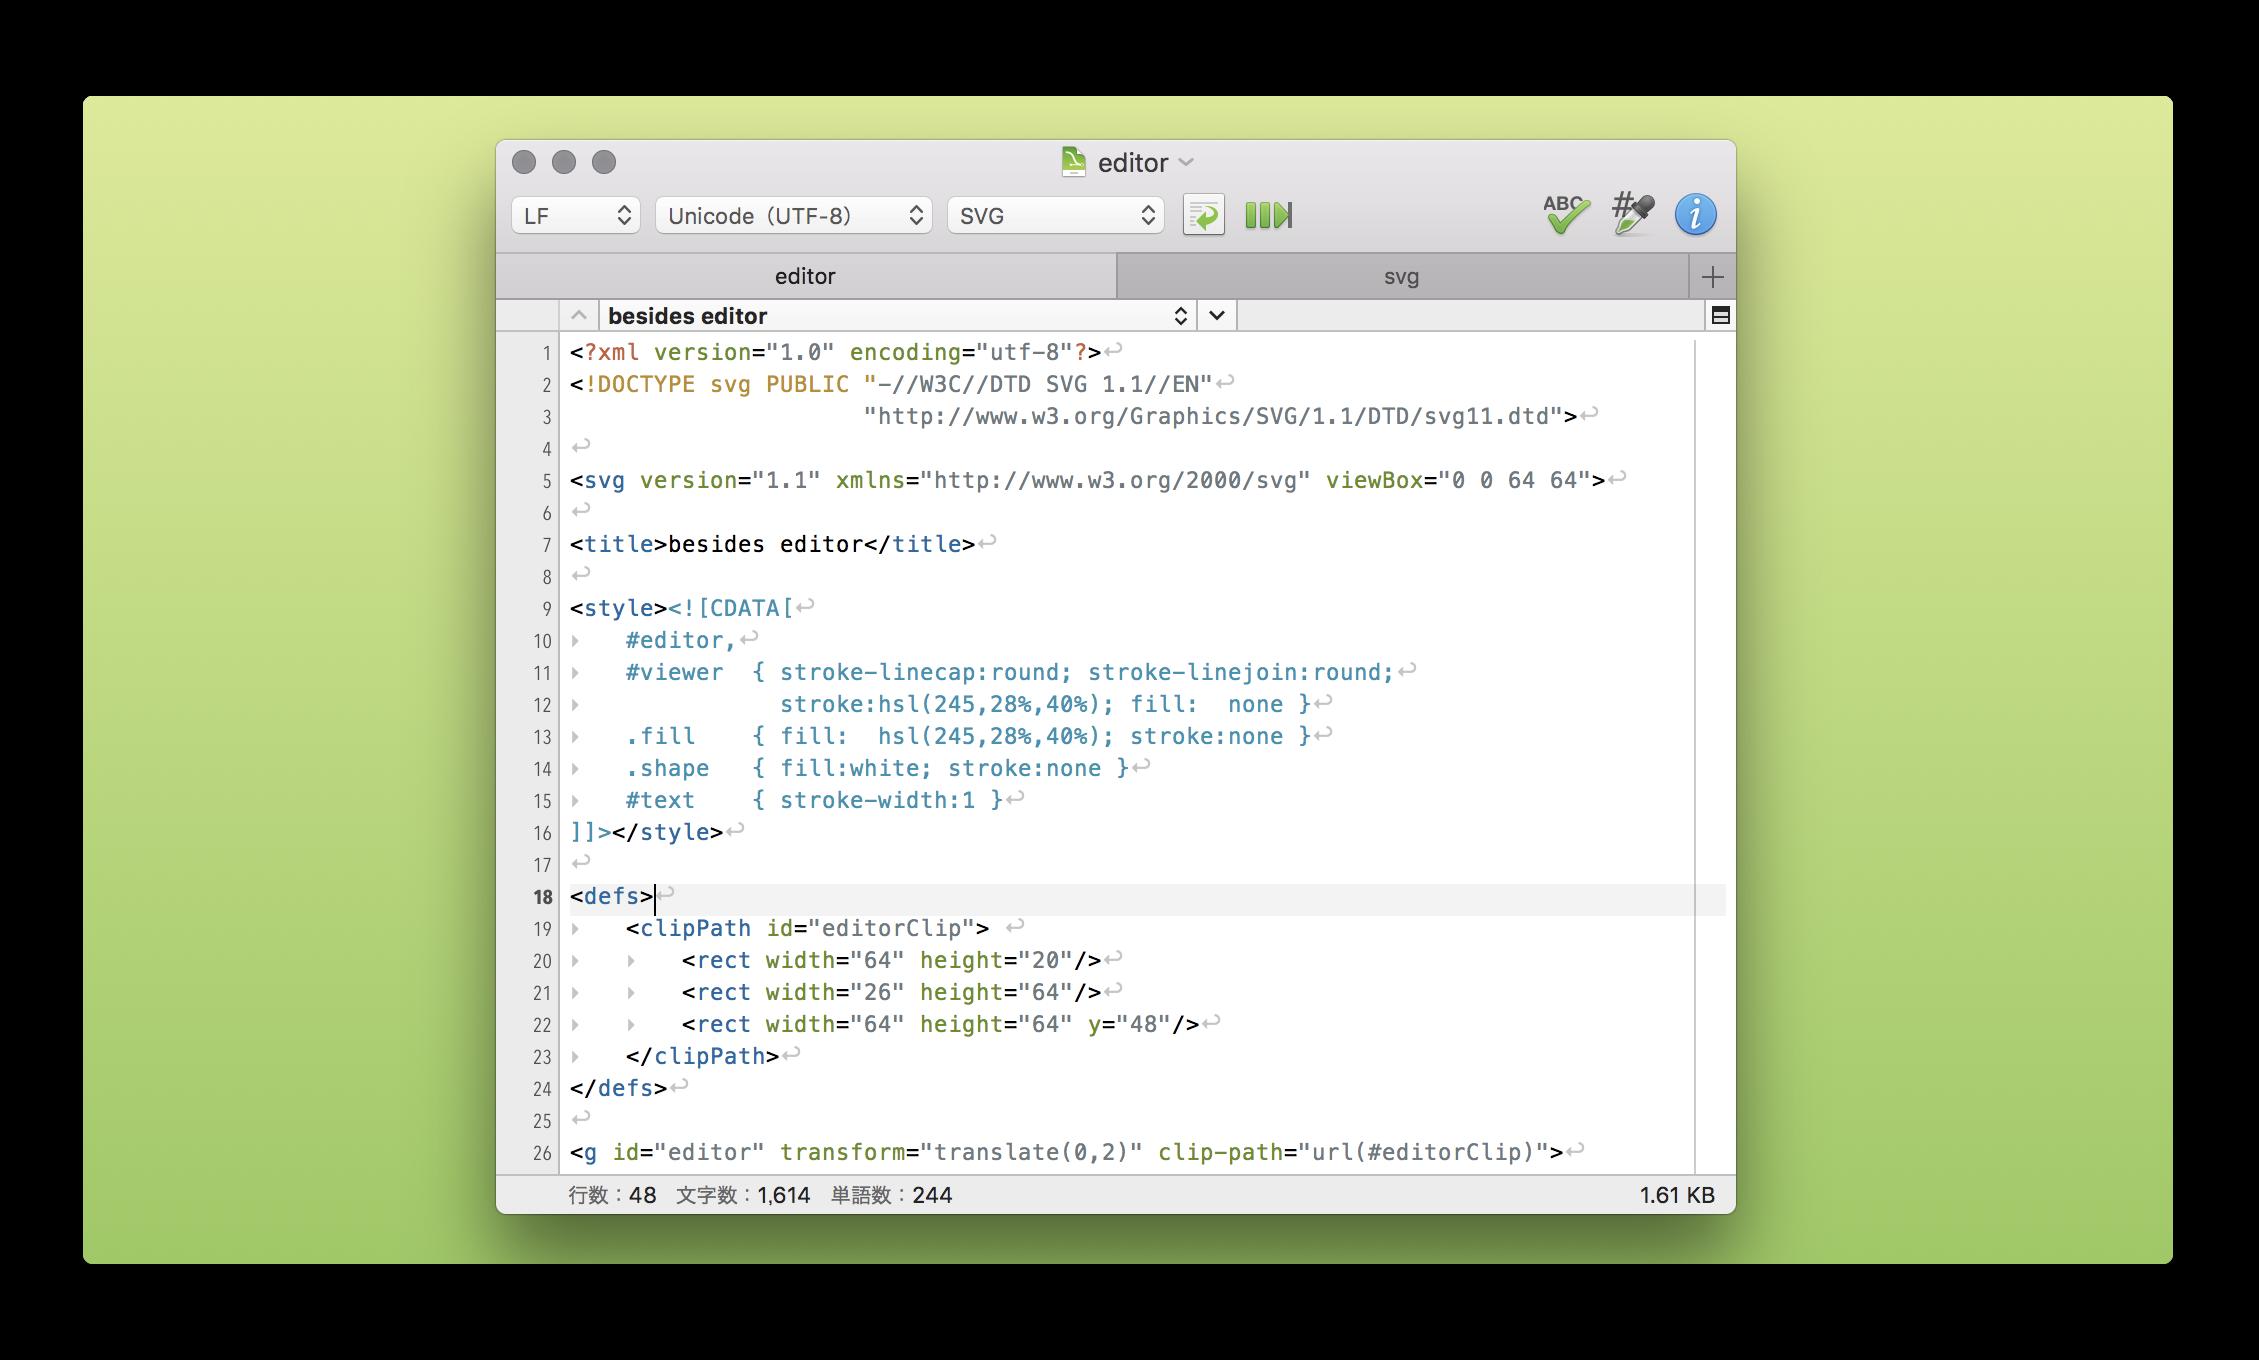 【Mac】テキストエディタ「CotEditor」がバージョンアップでiCloudドキュメントに対応など新機能を追加